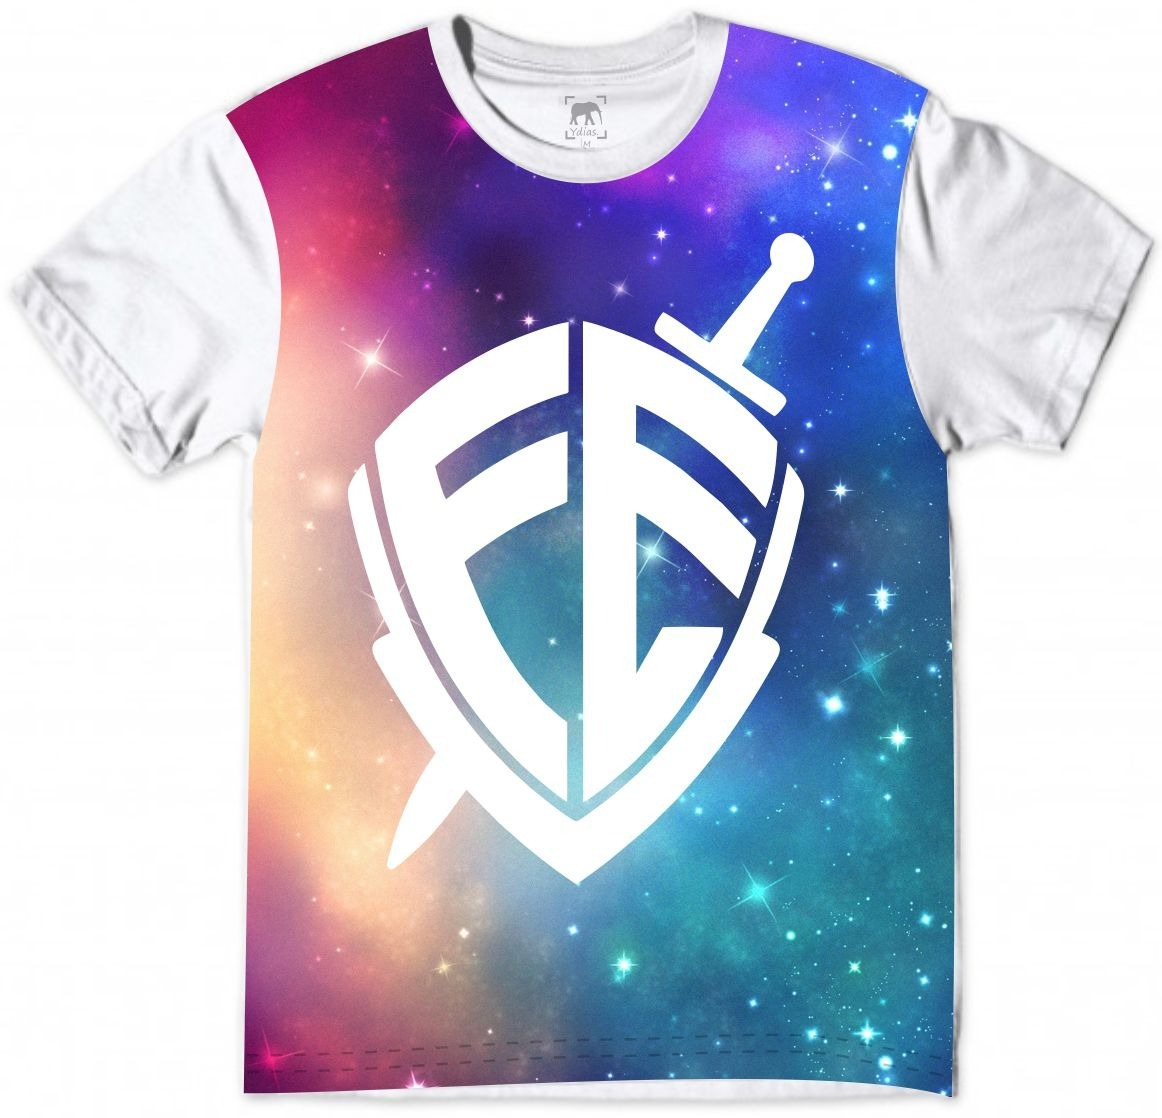 104022d72 camiseta religiosa fé moda gospel galáxia cristo branca. Carregando zoom.